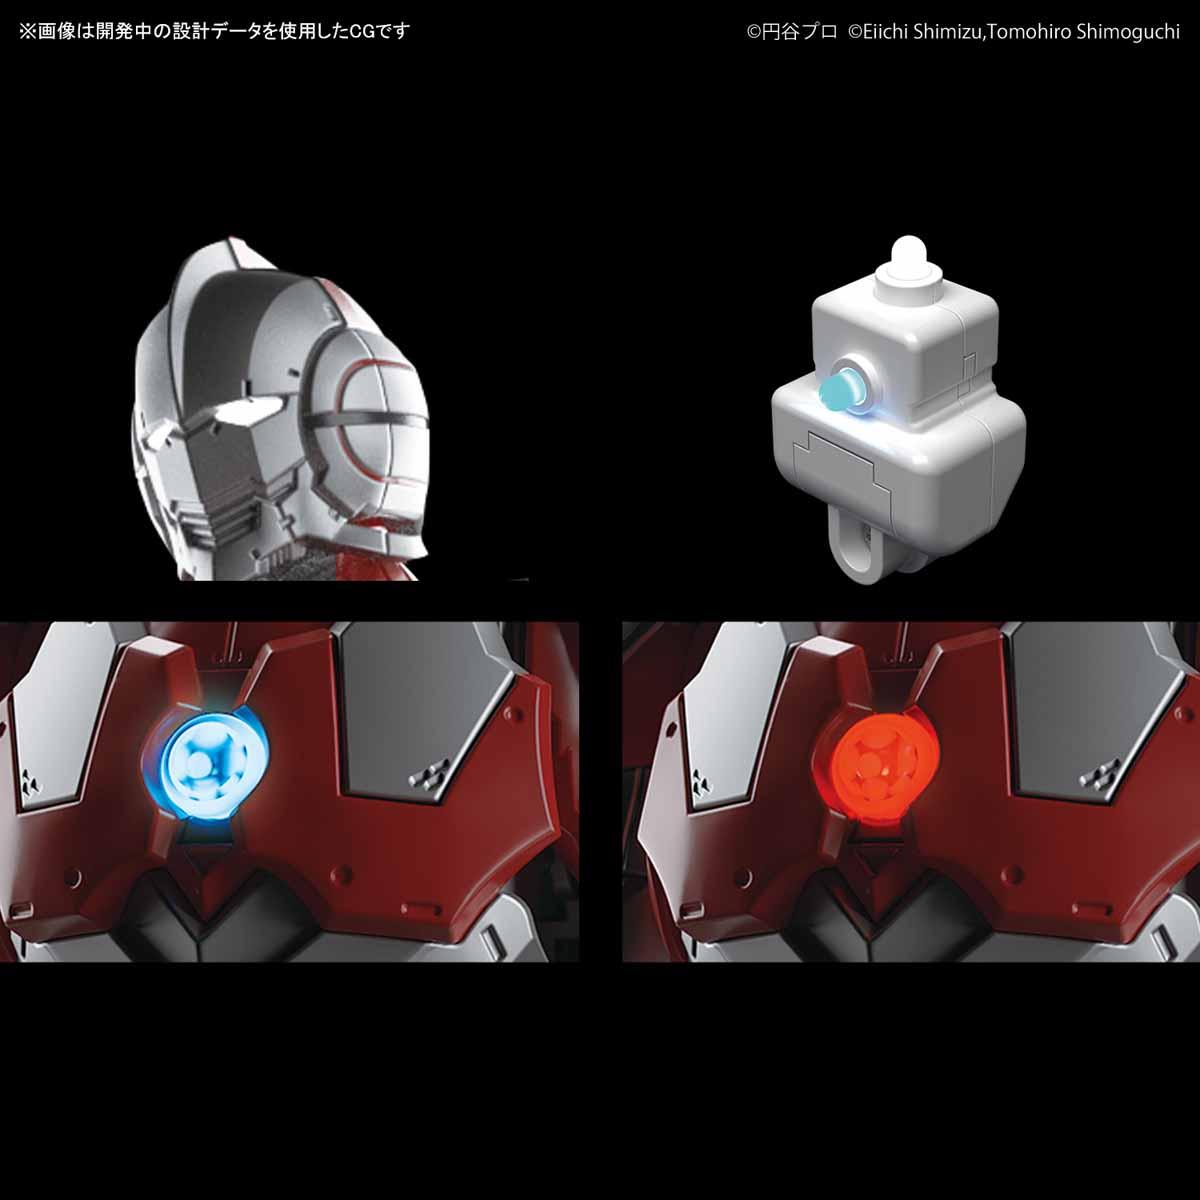 Ultraman - Figure-Rise Standard (Bandai) IqHoOLLR_o